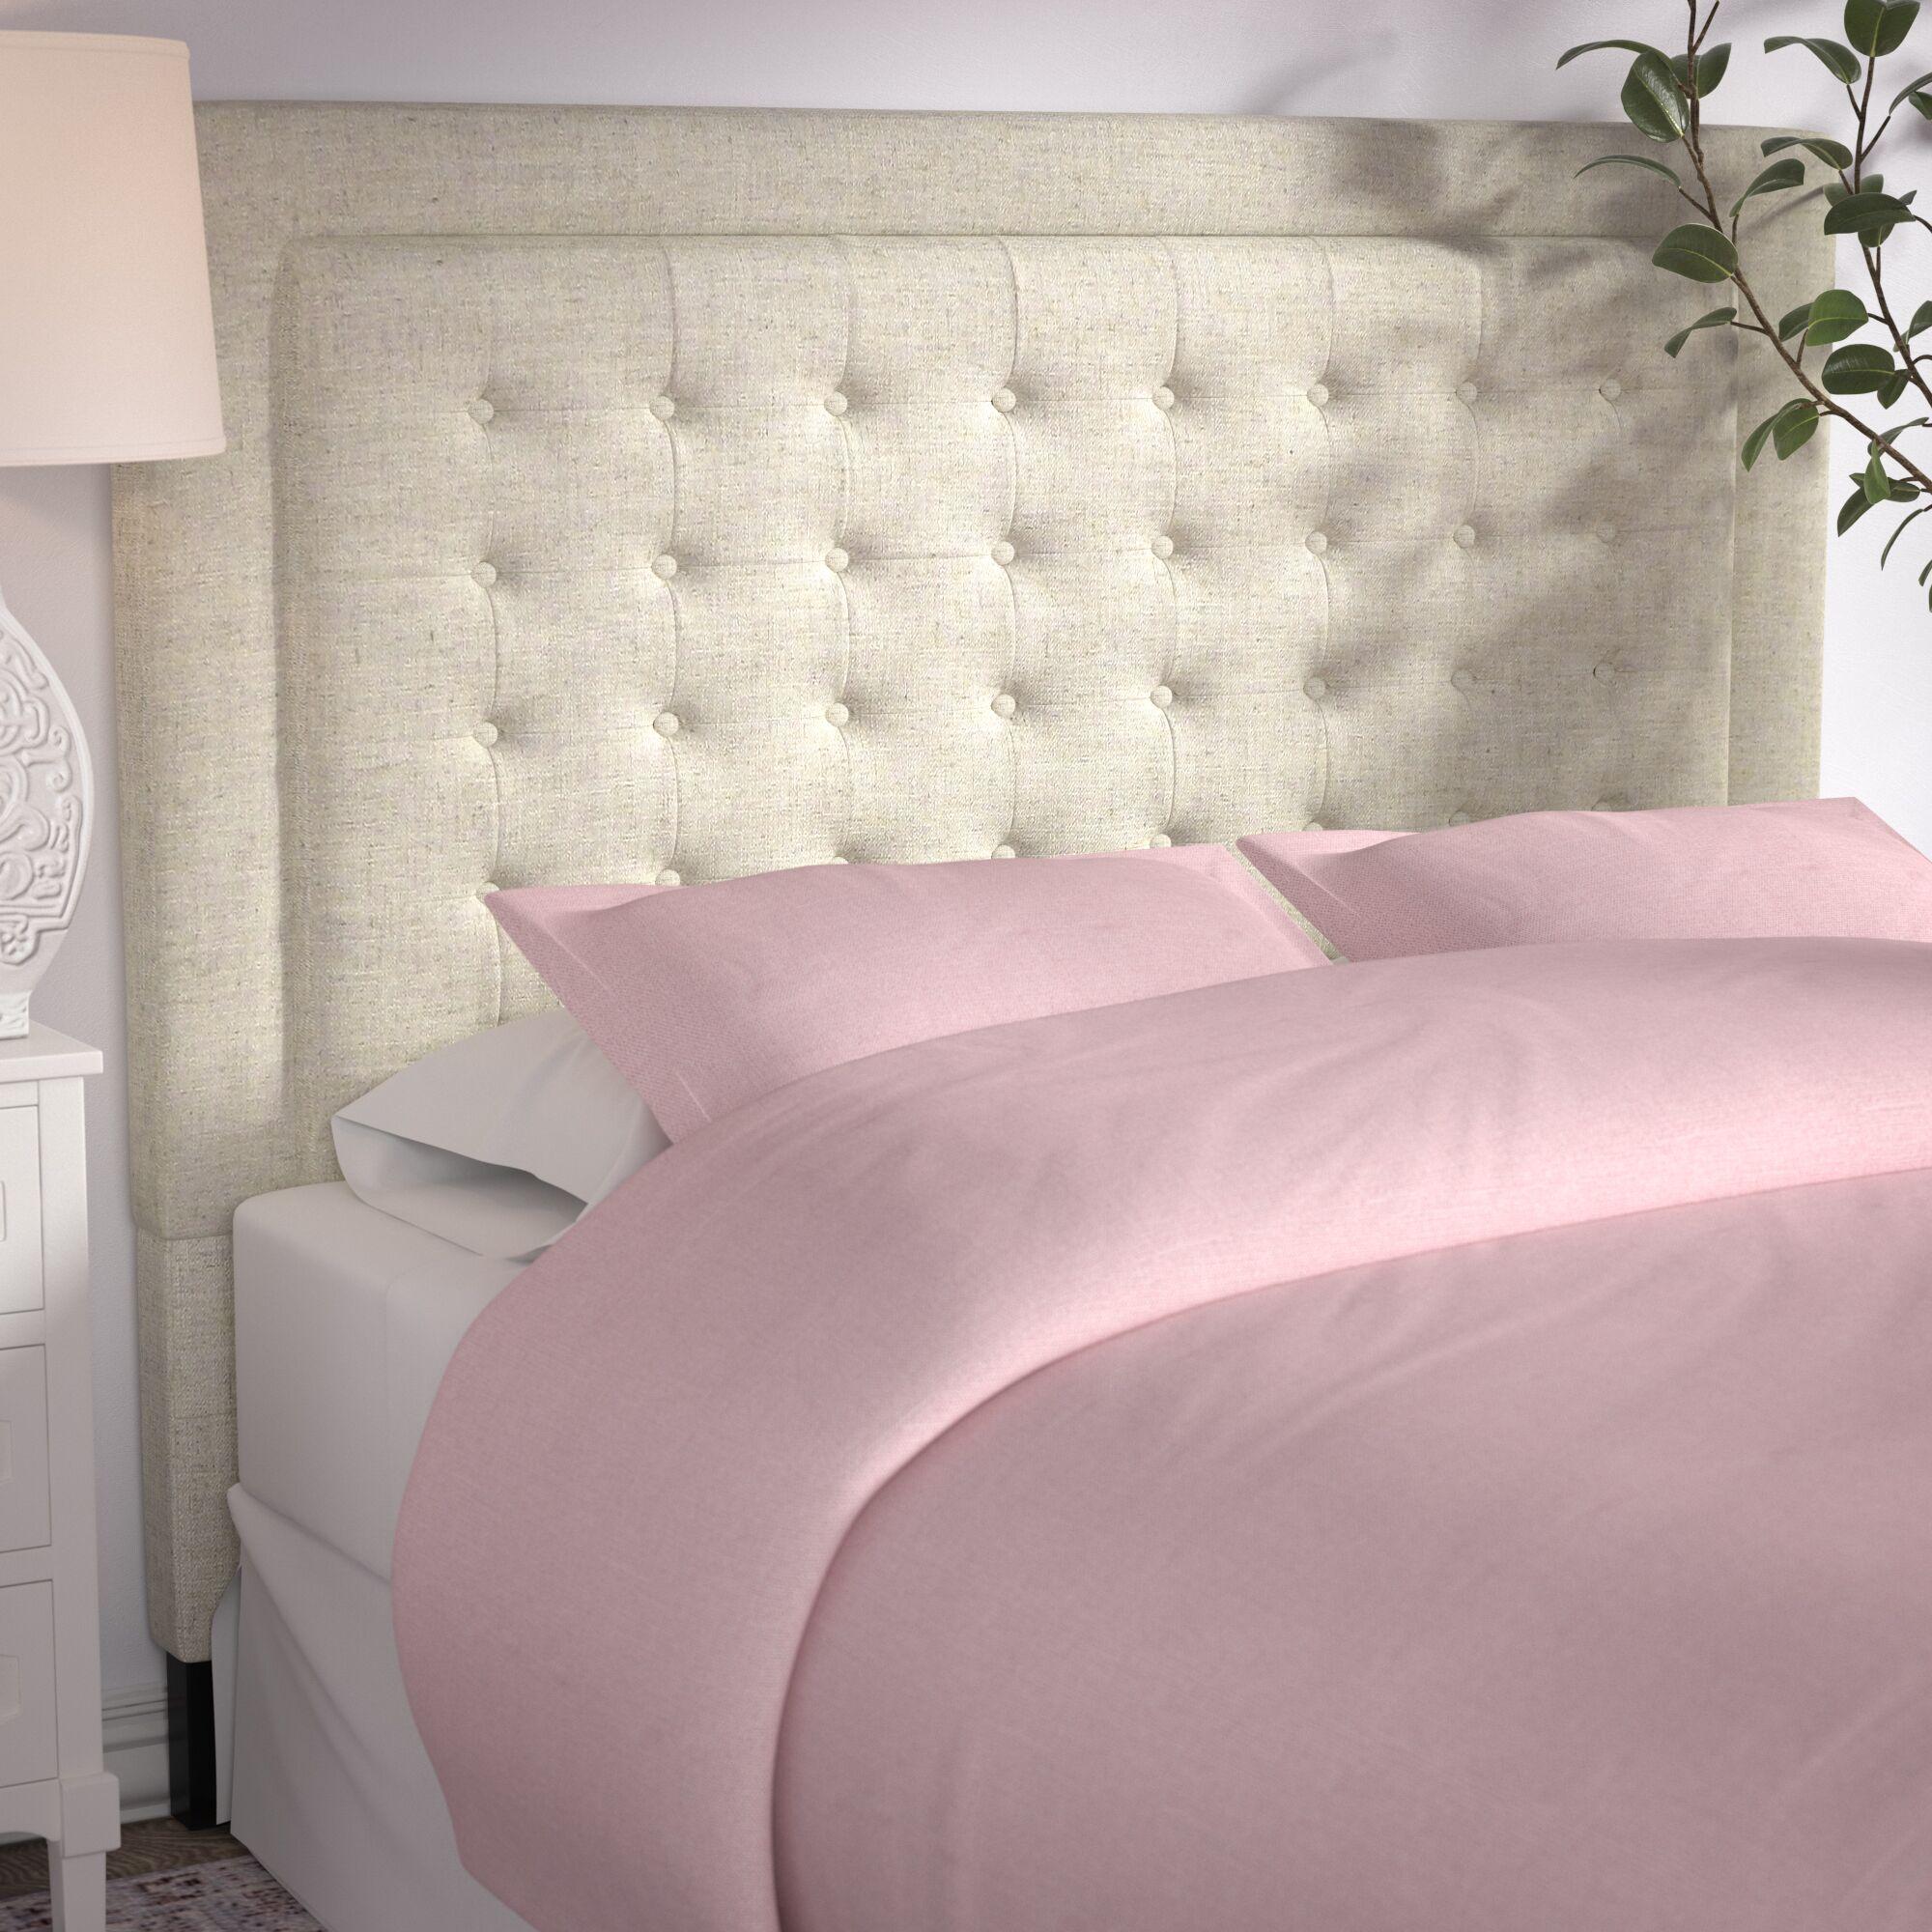 Woodside Upholstered Panel Headboard Size: Queen, Upholstery: Beige